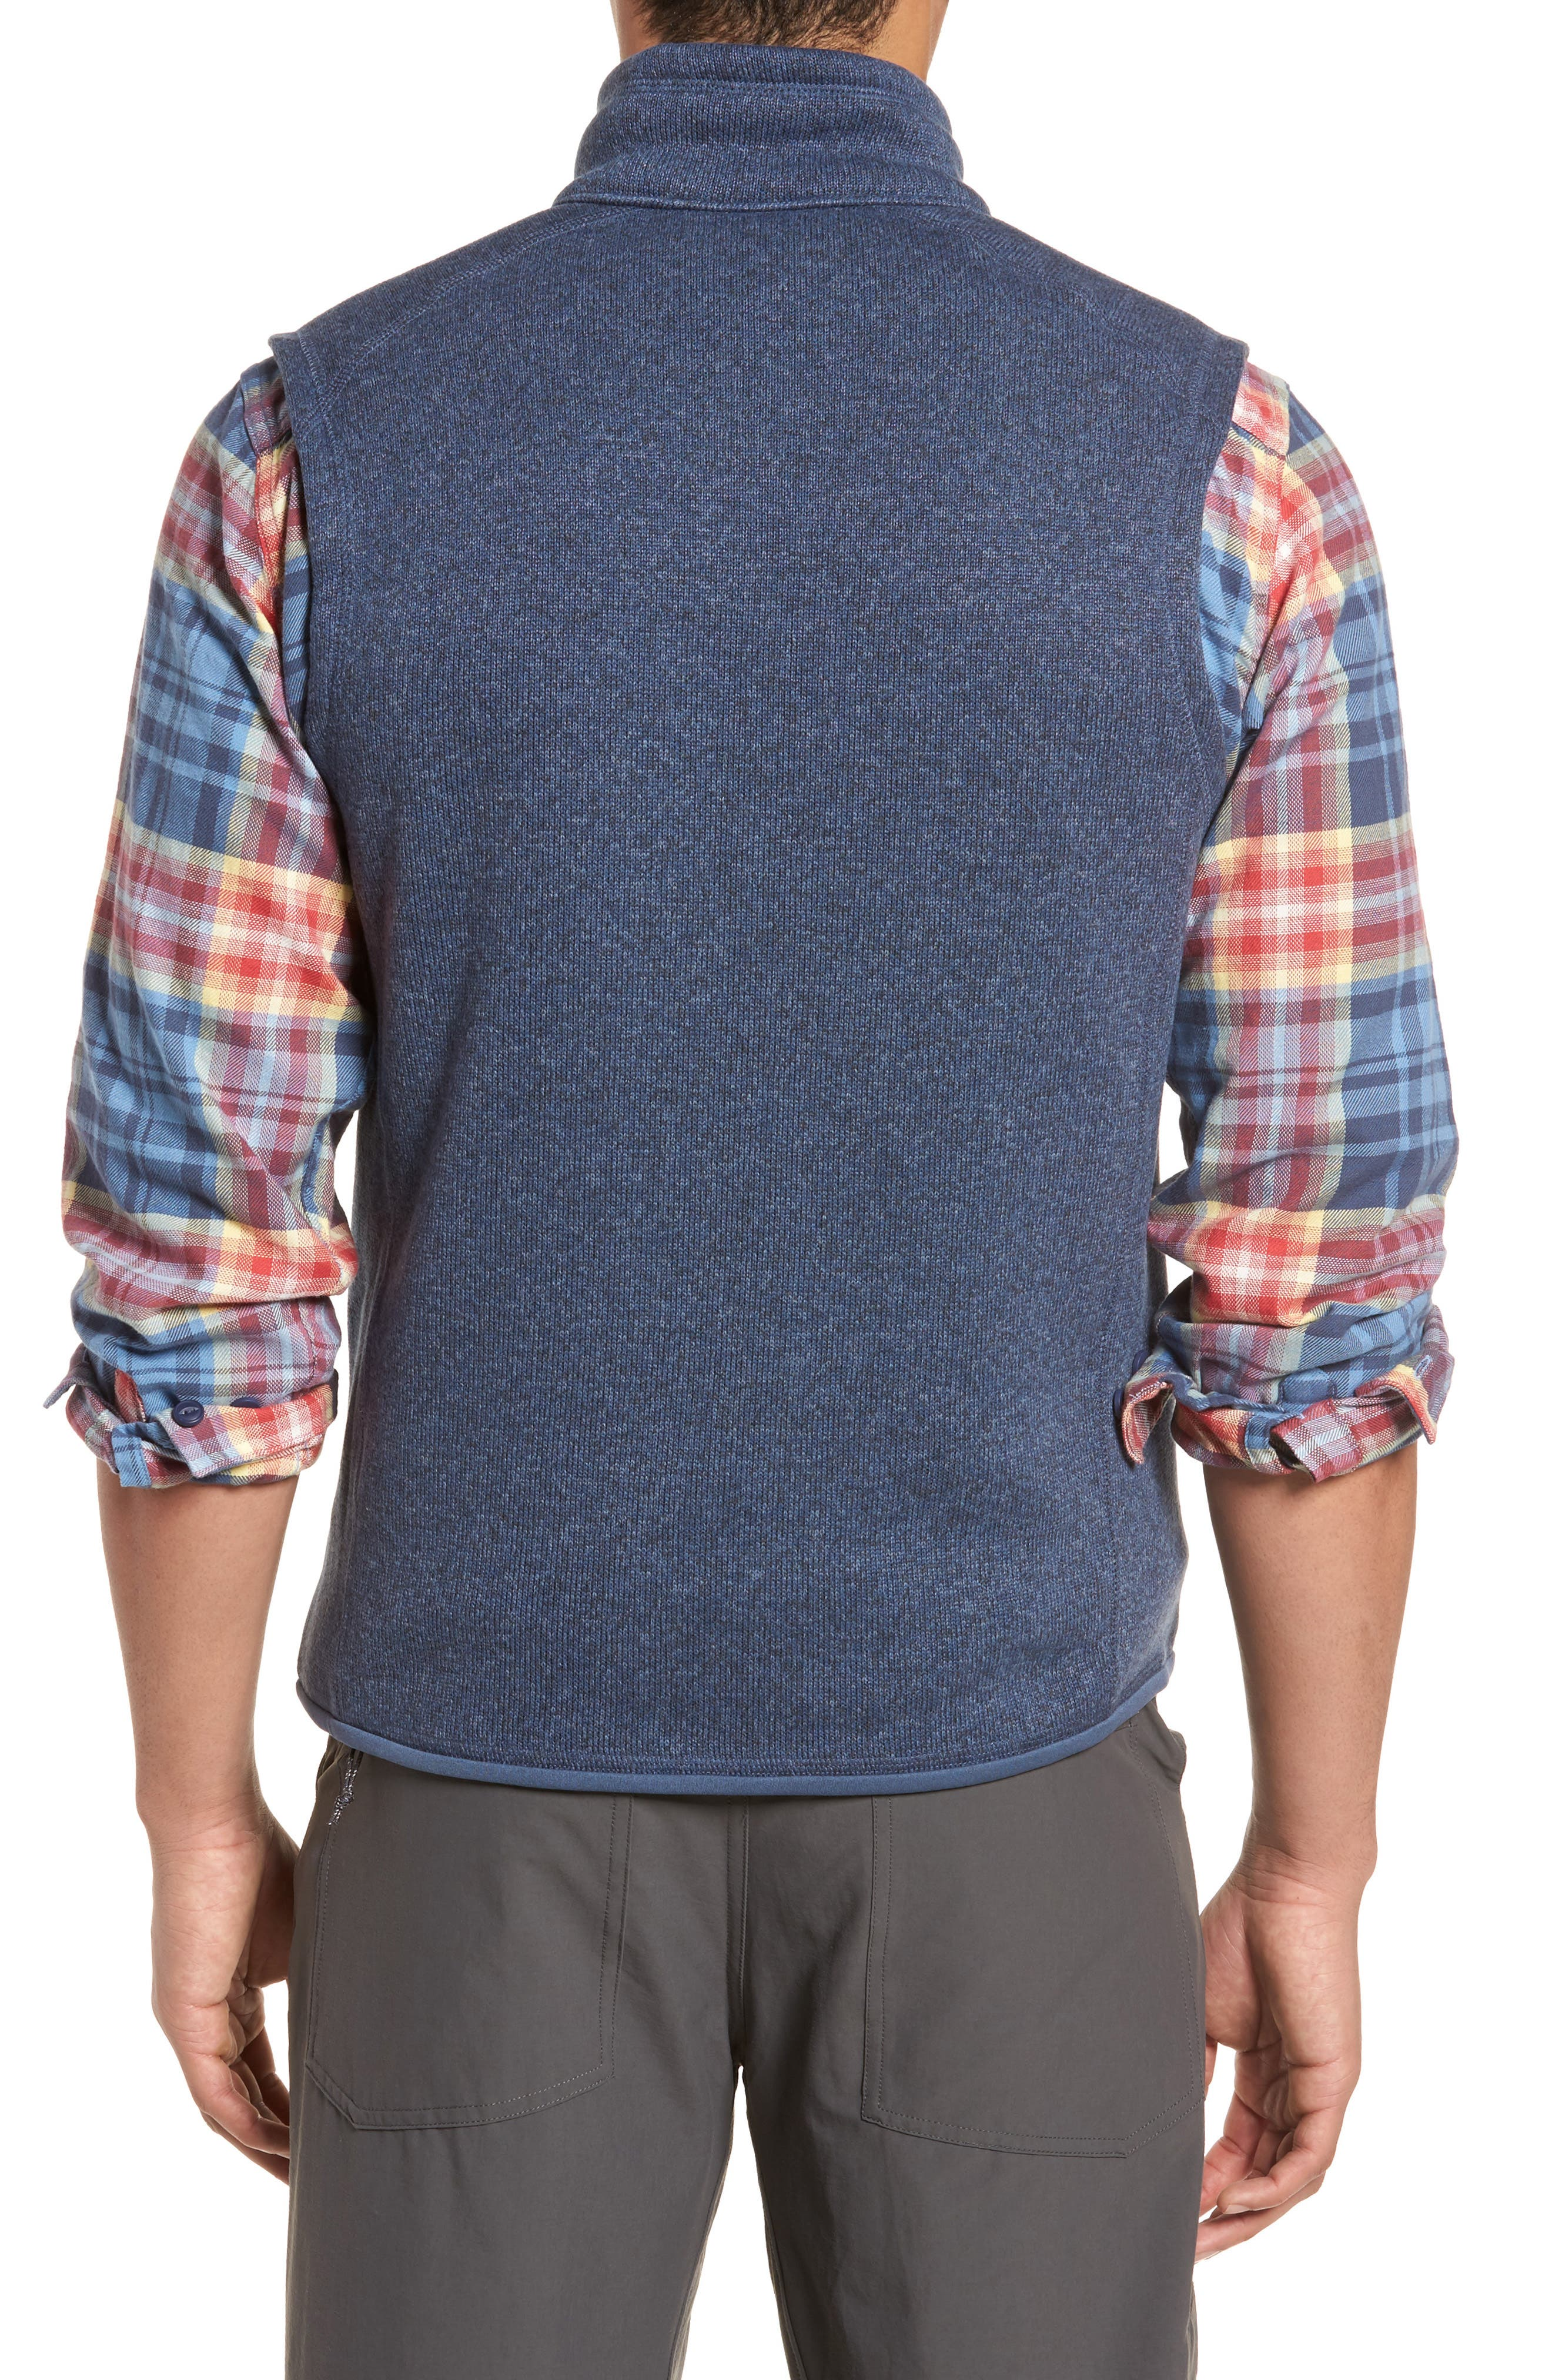 PATAGONIA, 'Better Sweater' Zip Front Vest, Alternate thumbnail 2, color, DOLOMITE BLUE